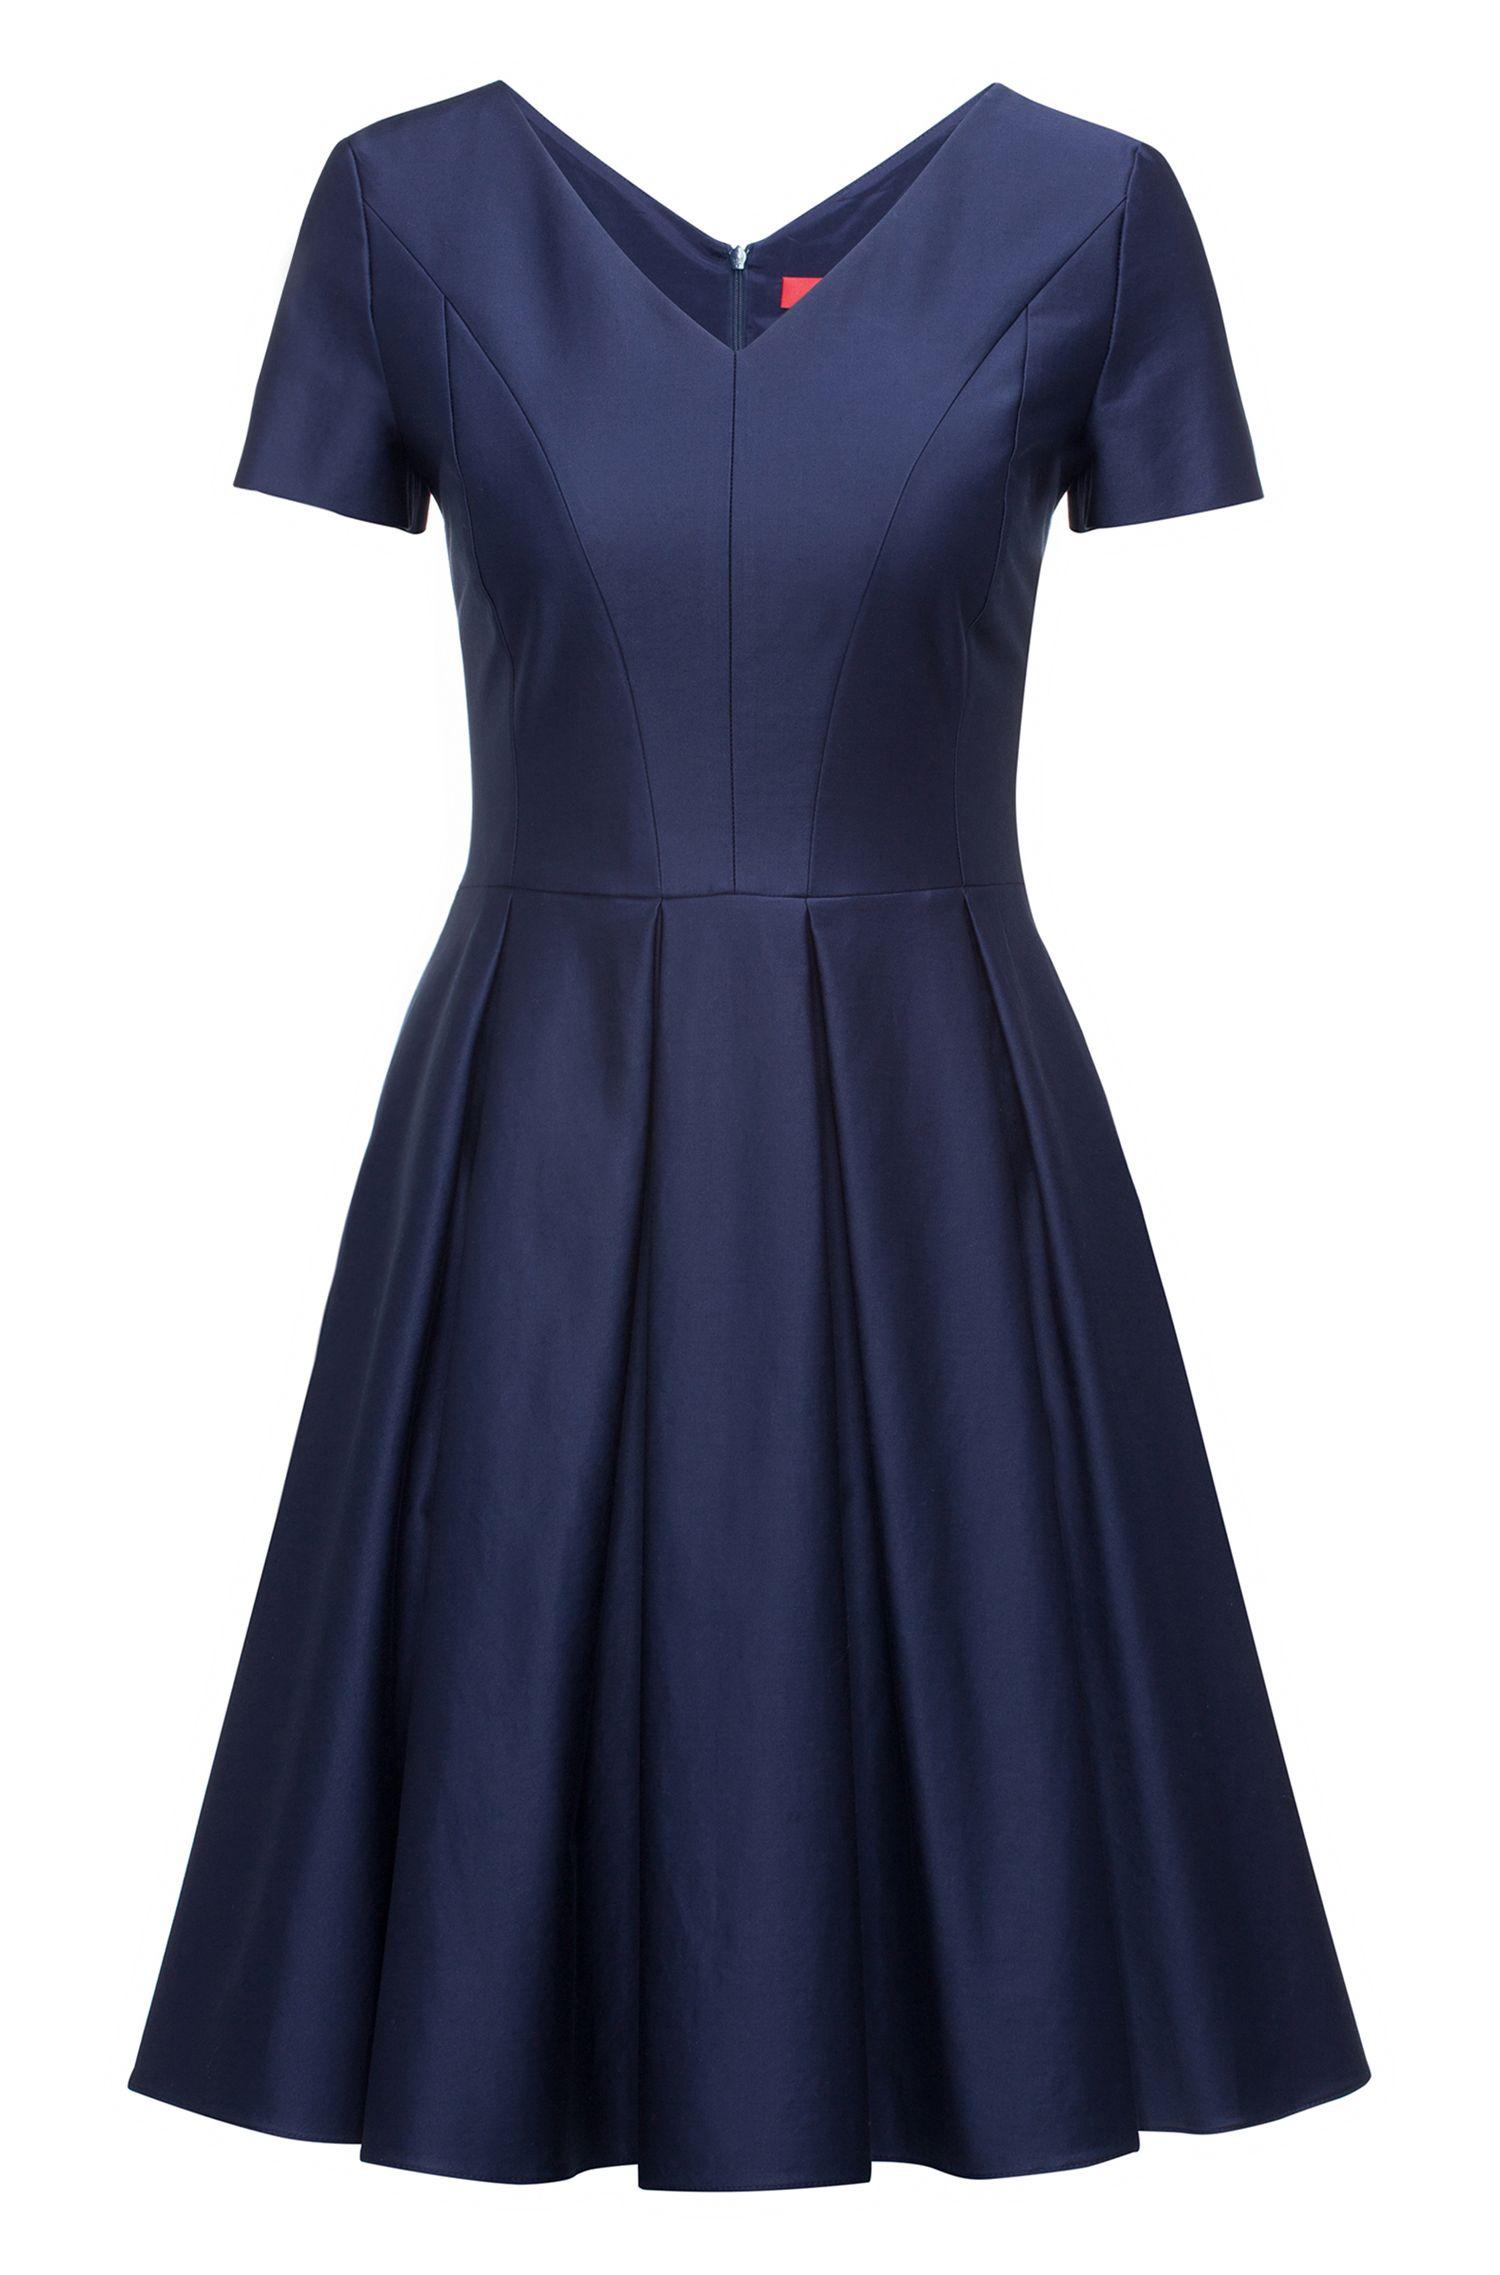 Modern V-neck dress in stretch cotton with voluminous skirt